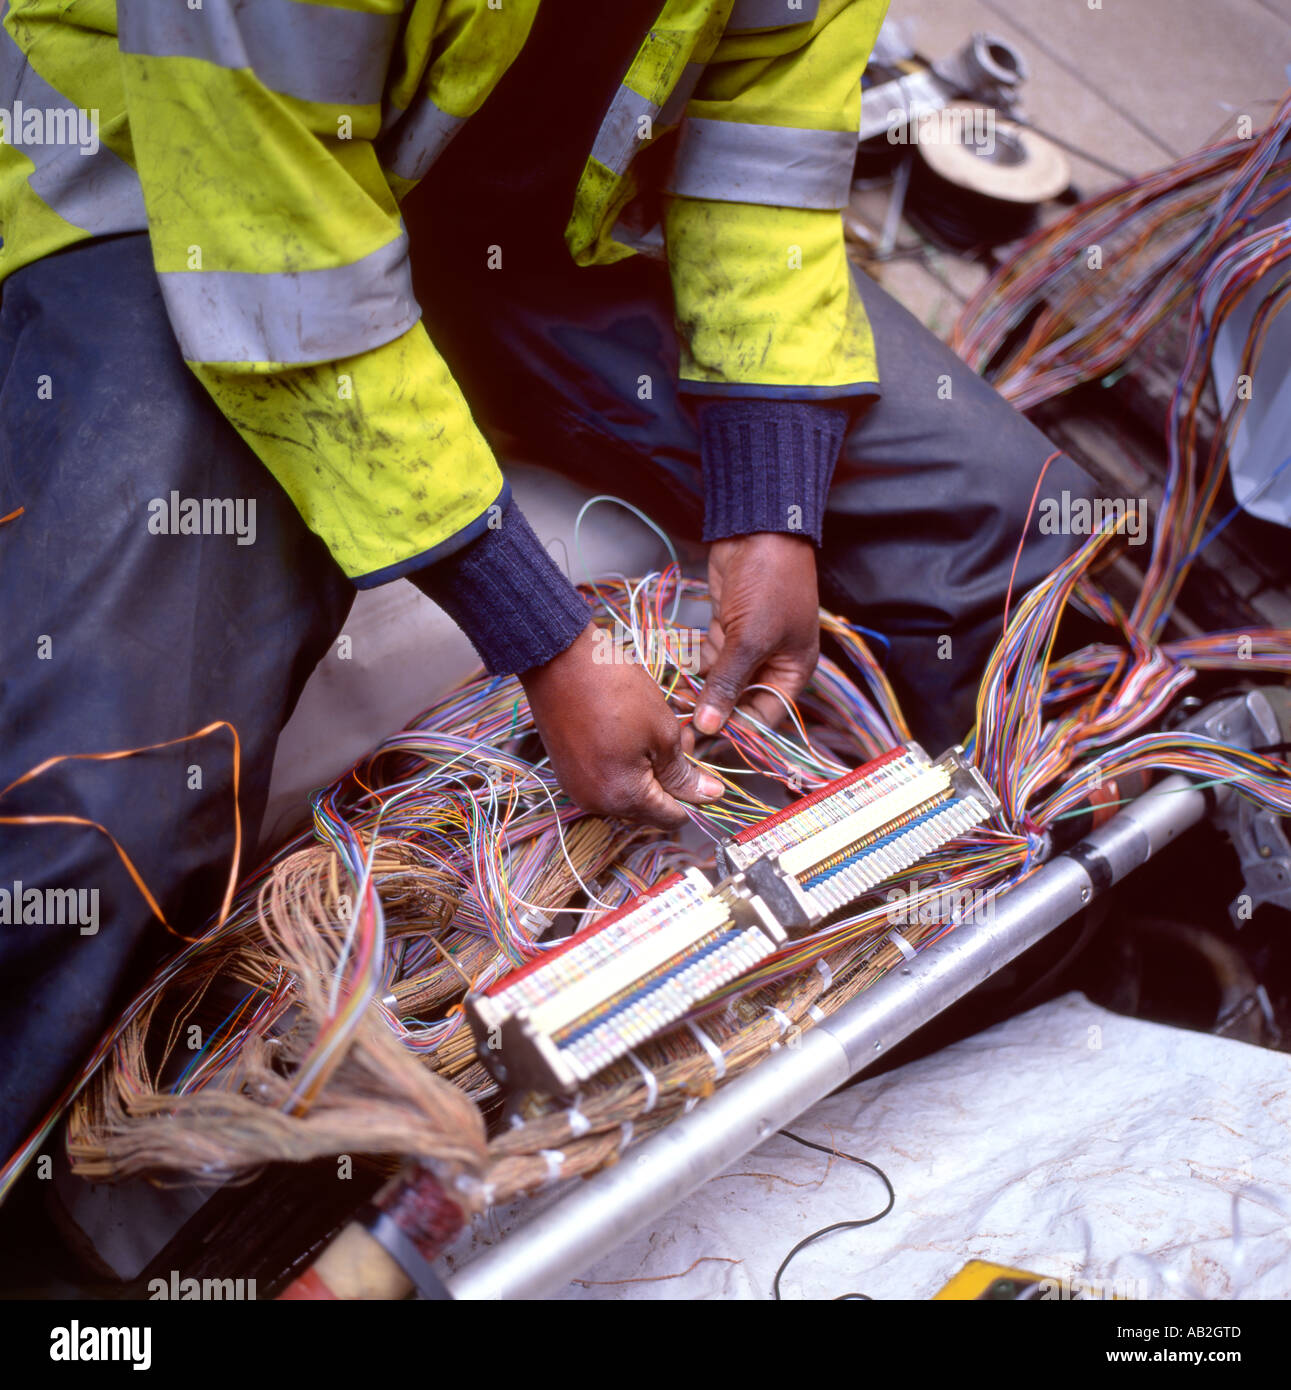 A British Telecom worker working with wiring from under pavement Regent Street London UK : british wiring - yogabreezes.com